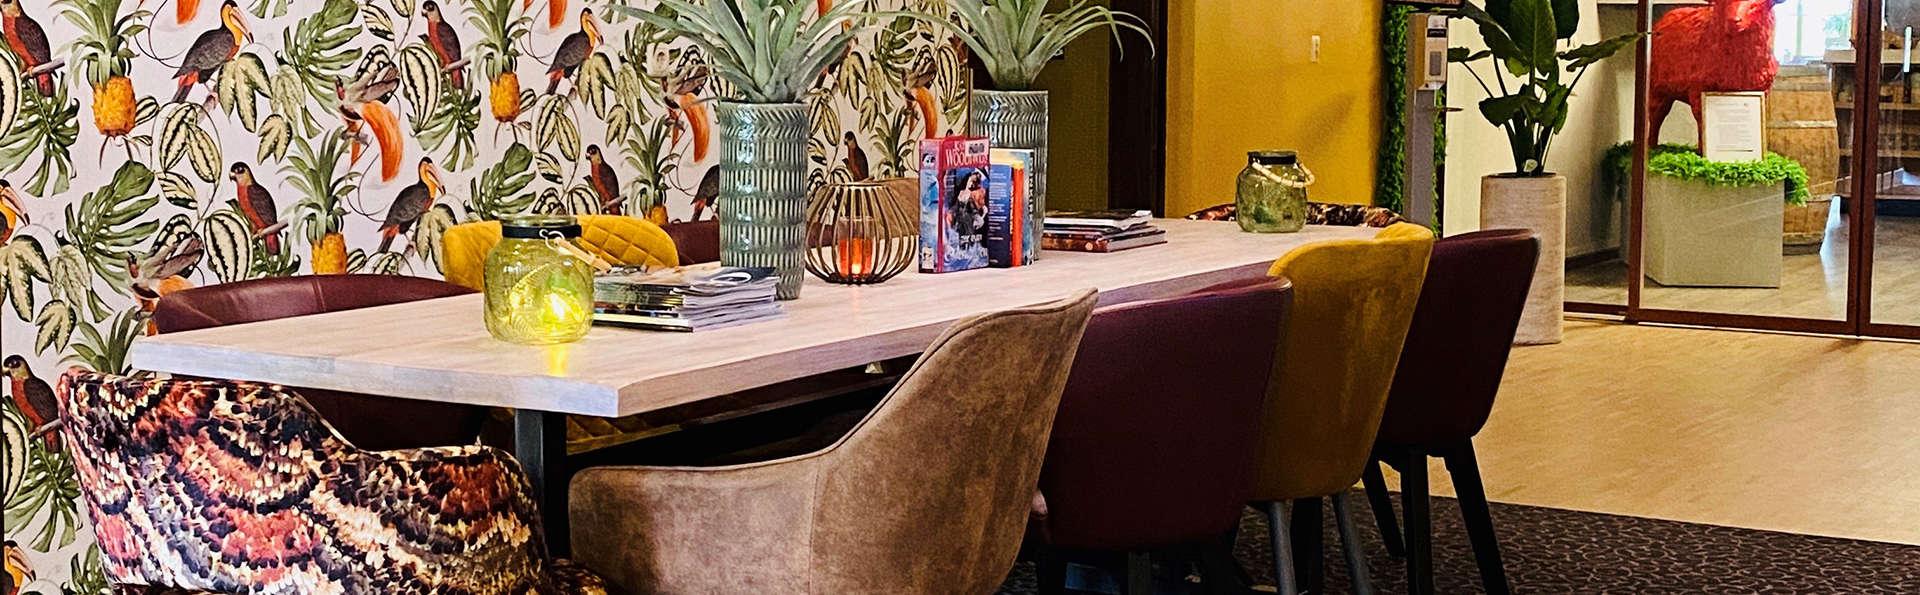 Hotel Schaepkens Van St Fijt - EDIT_Lobby.jpg